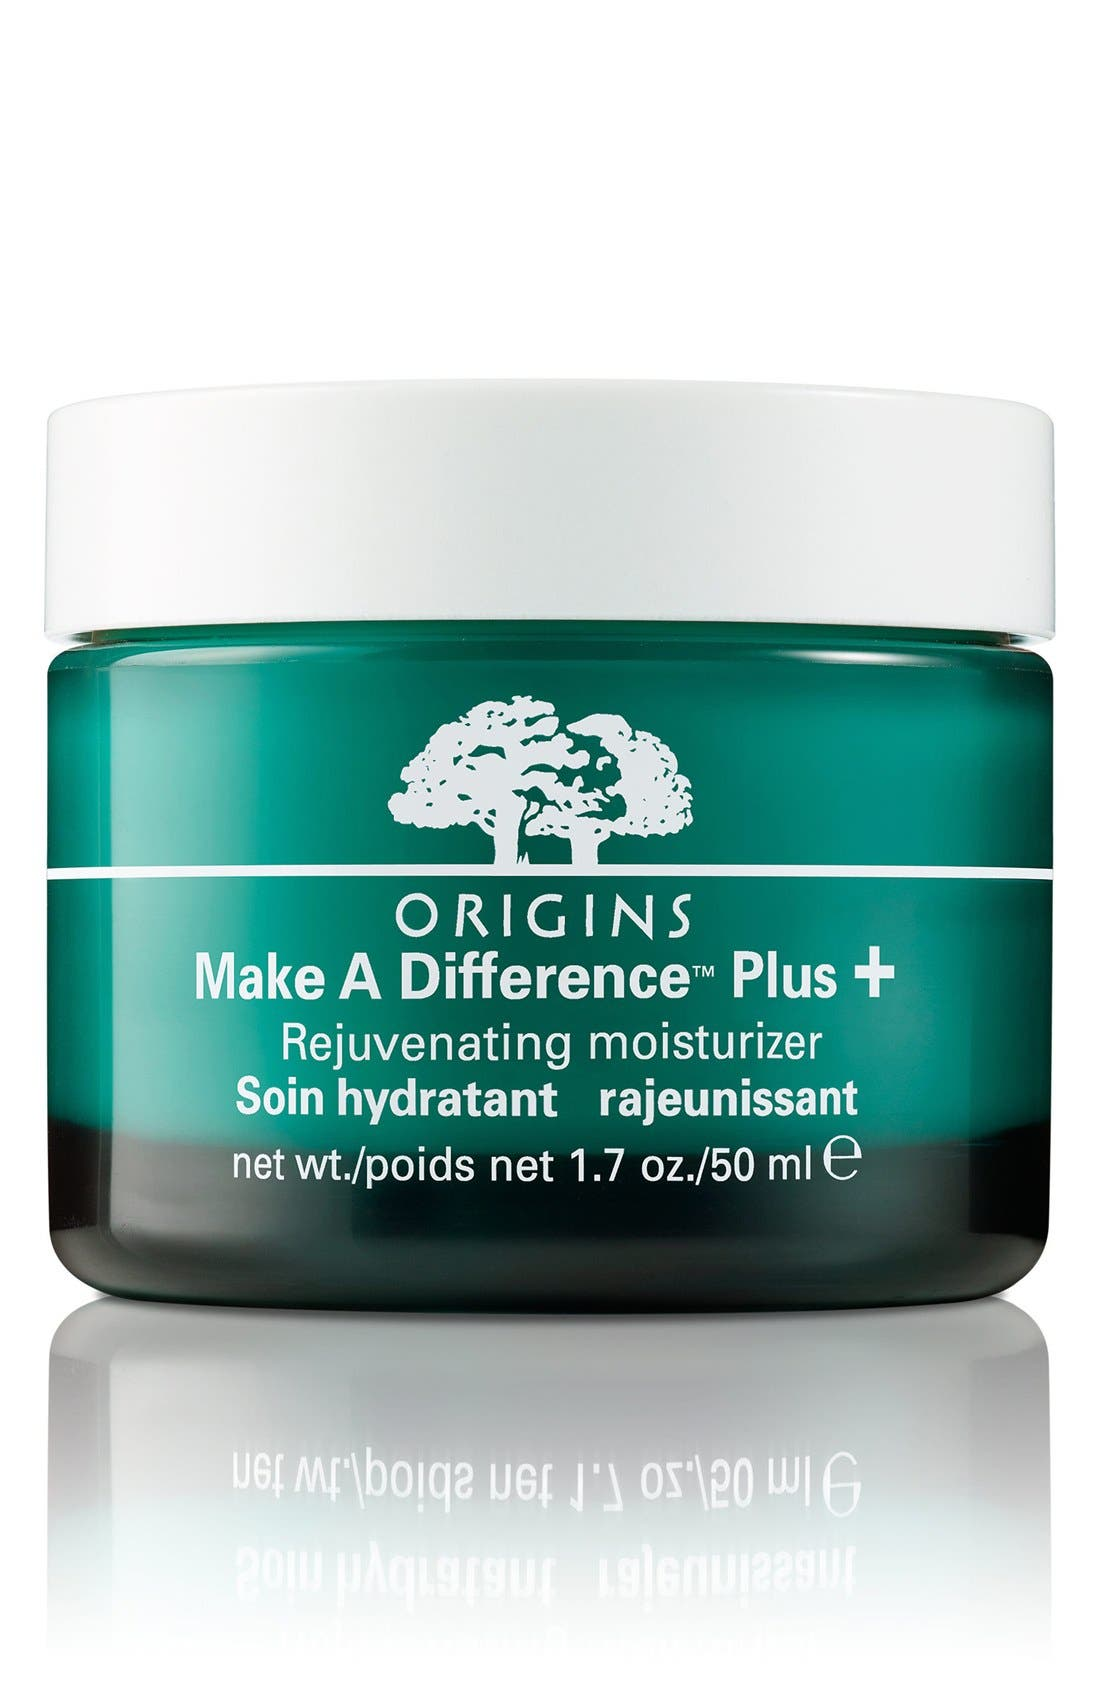 Origins Make A Difference™ Plus+ Rejuvenating Moisturizer